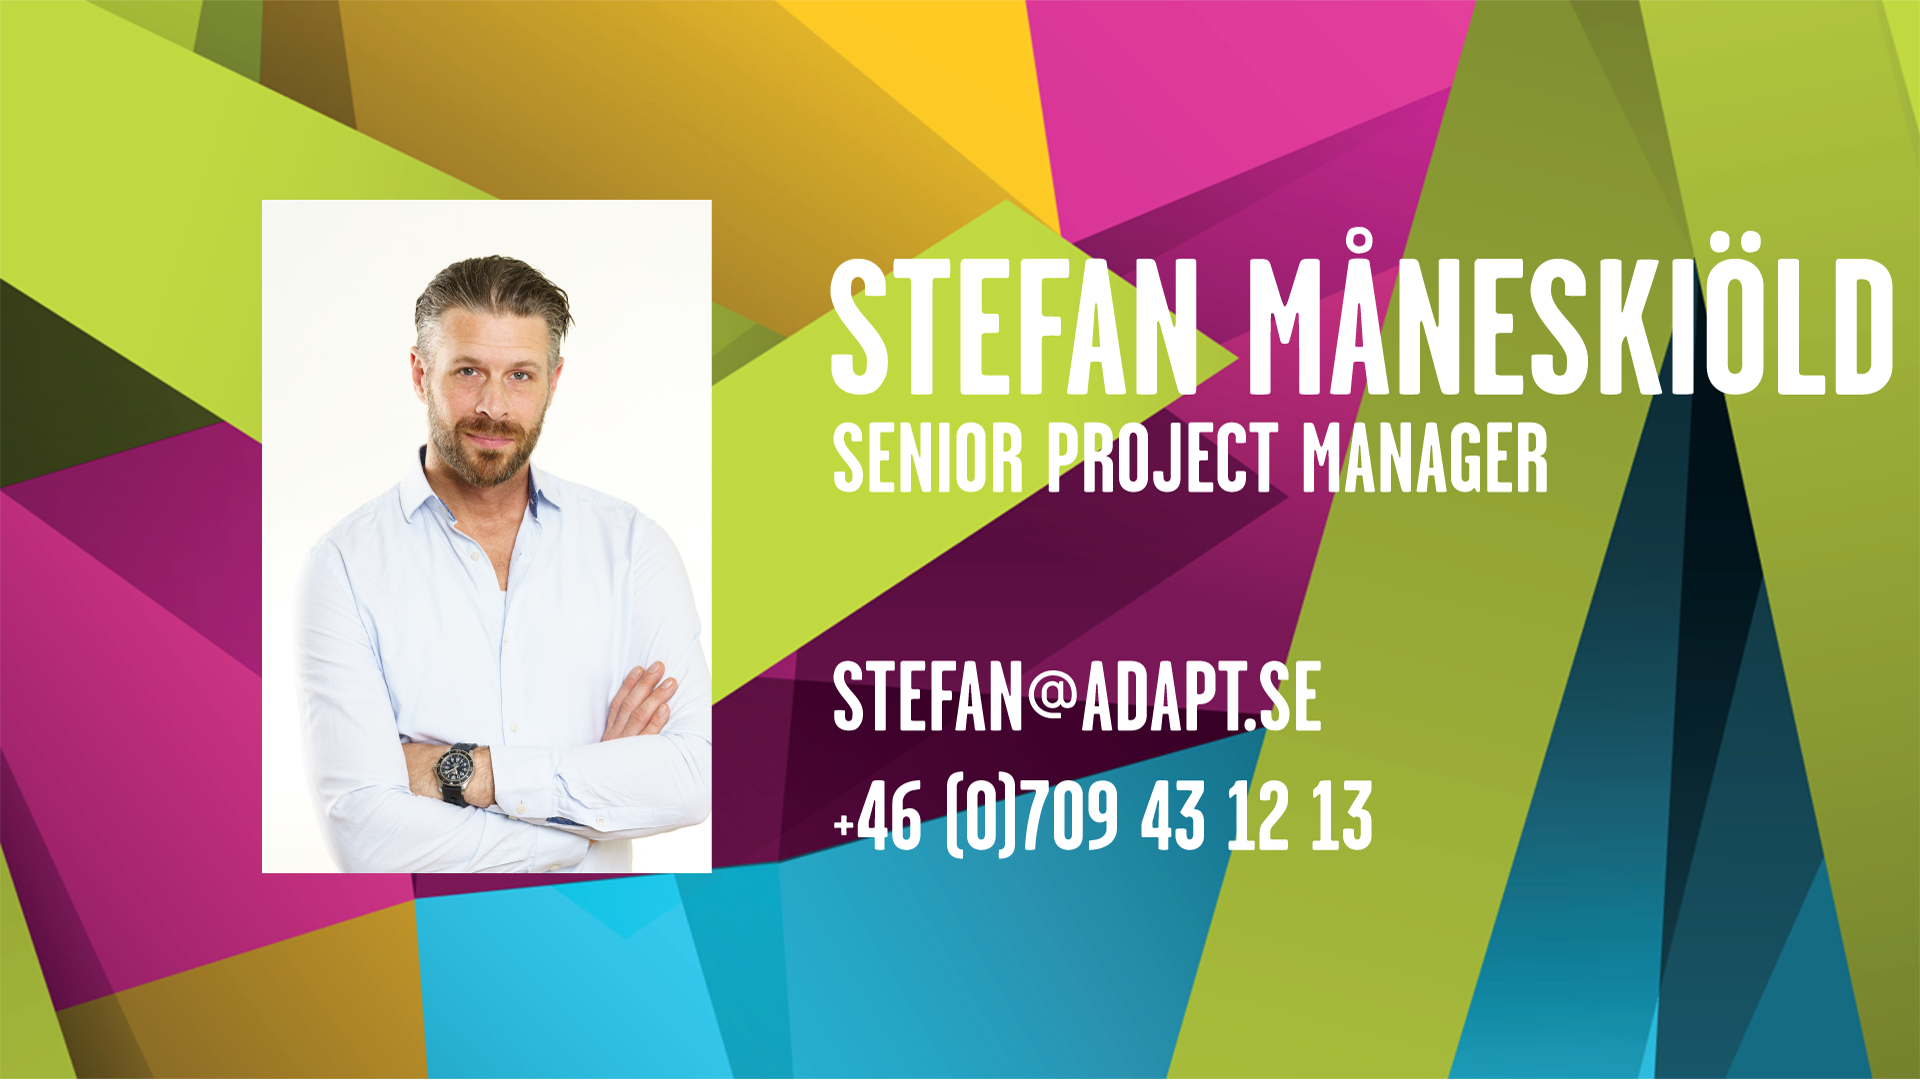 Stefan_1920x1080px.png